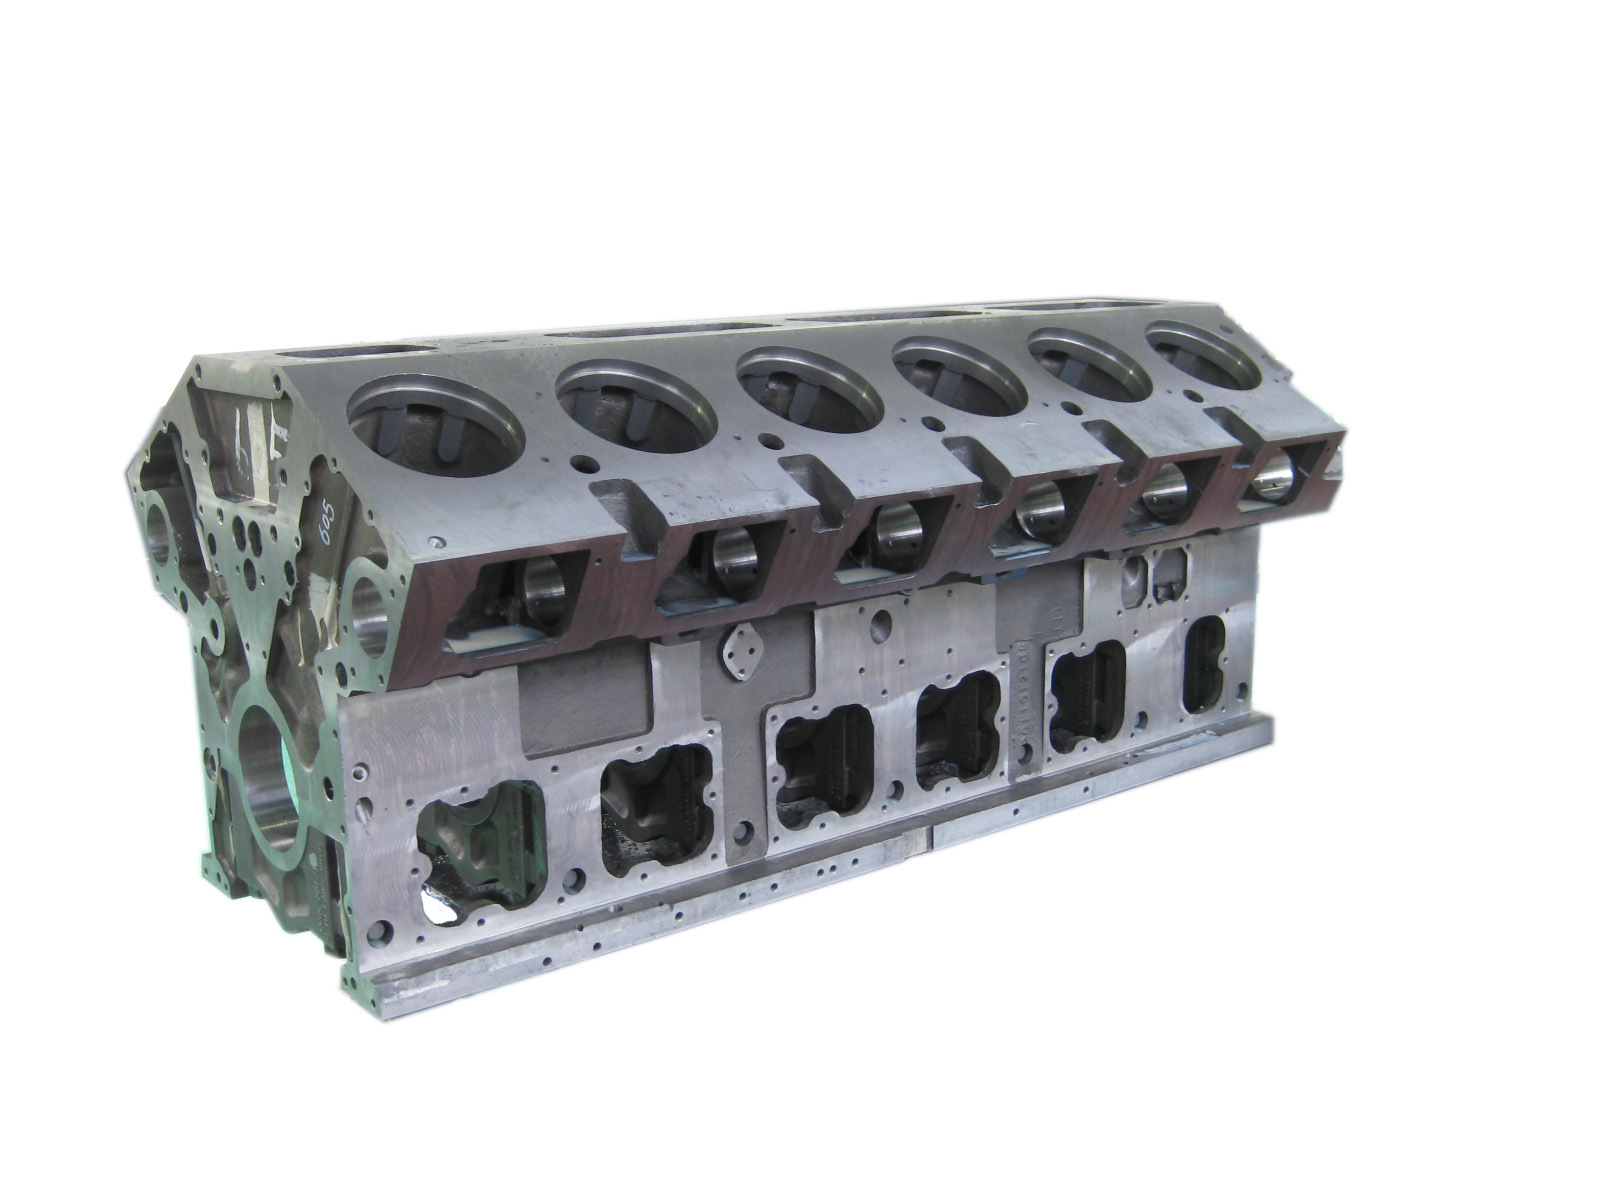 Cummins Engine Block on Ford Flathead V8 Crate Engine For Sale